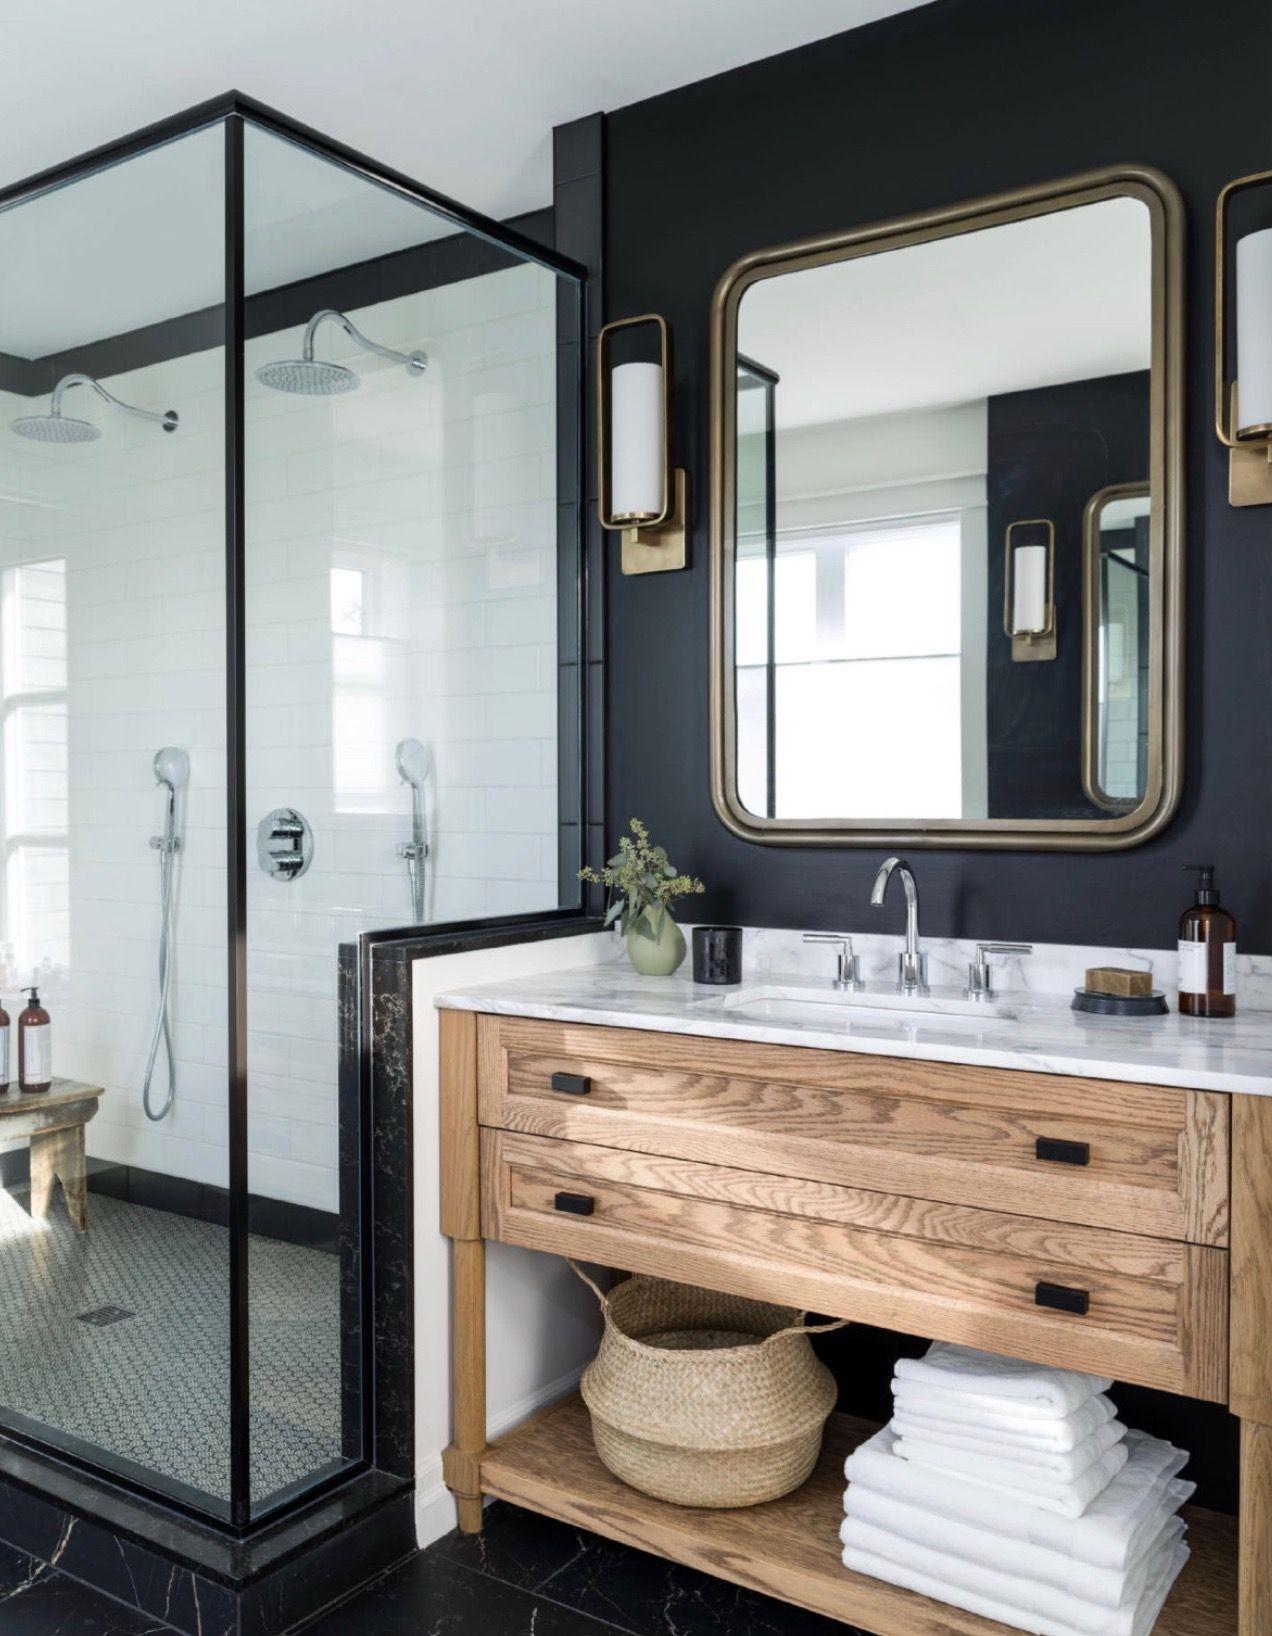 Modern Bathroom With Dark Walls Natural Wood Vanity Modern Farmhouse Bathroom Design Modern Bathroom Bathroom Interior